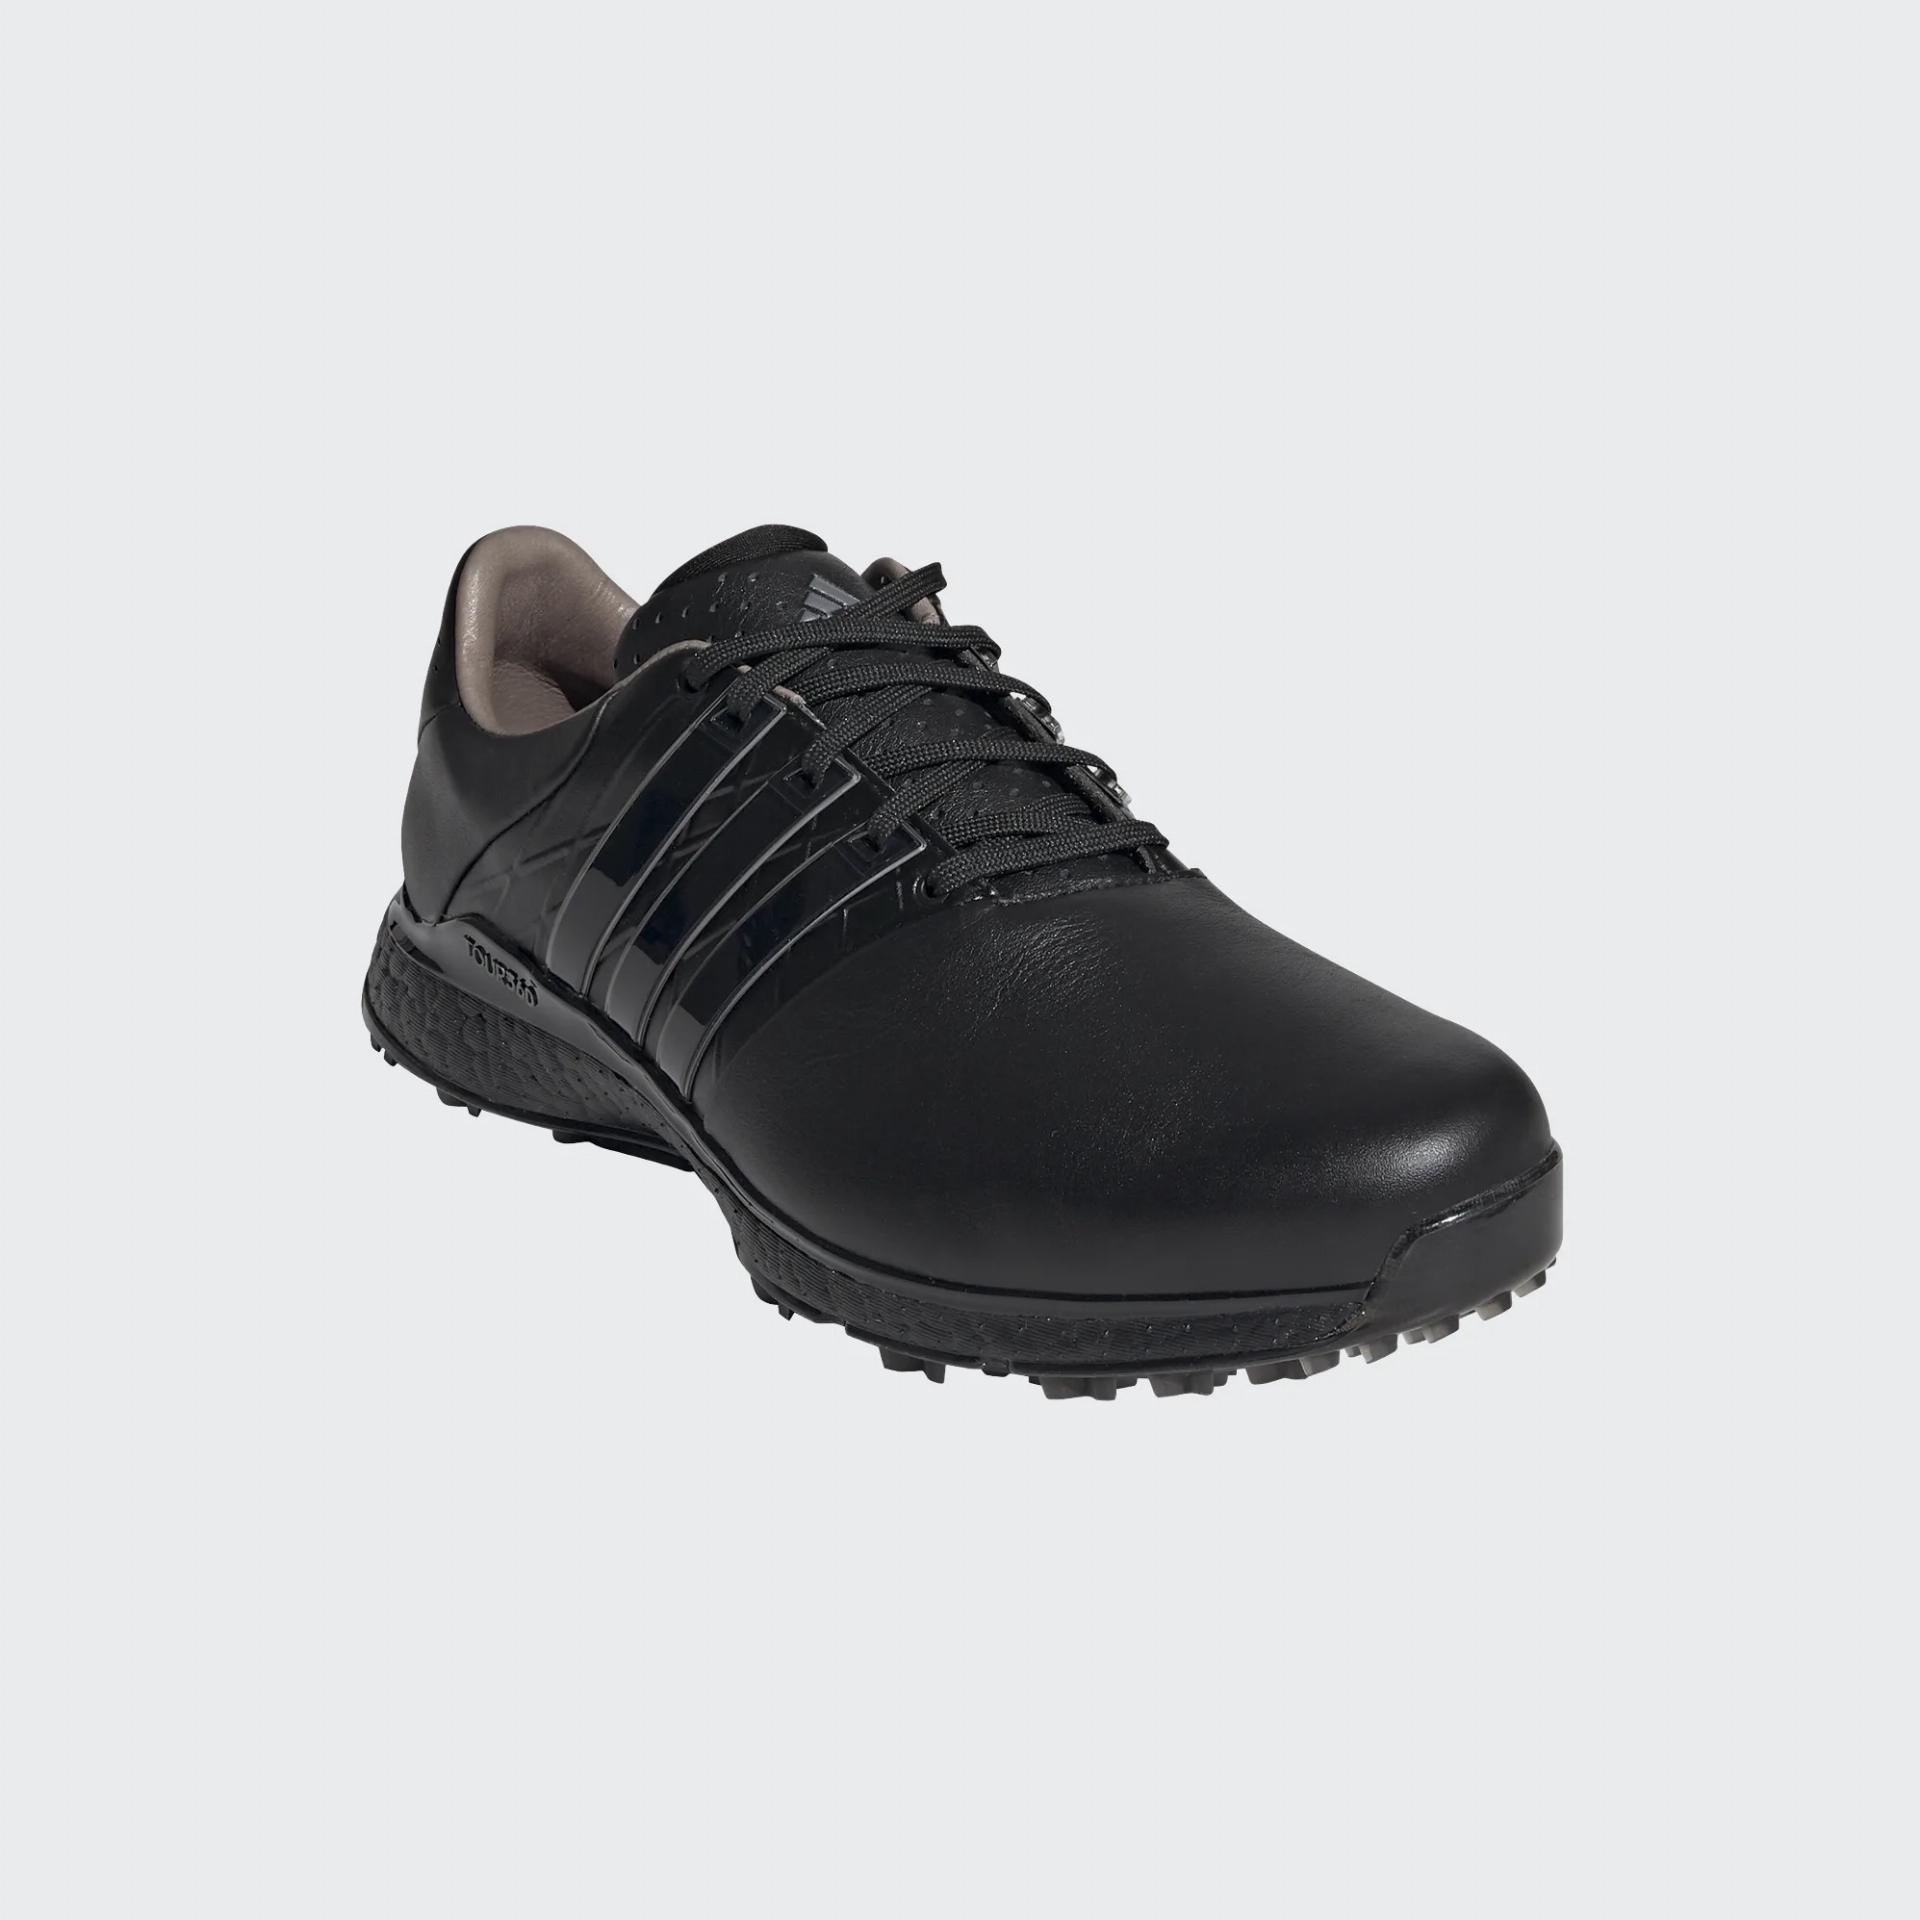 Adidas - Tour360 XT-SL 2 (Wide) - black